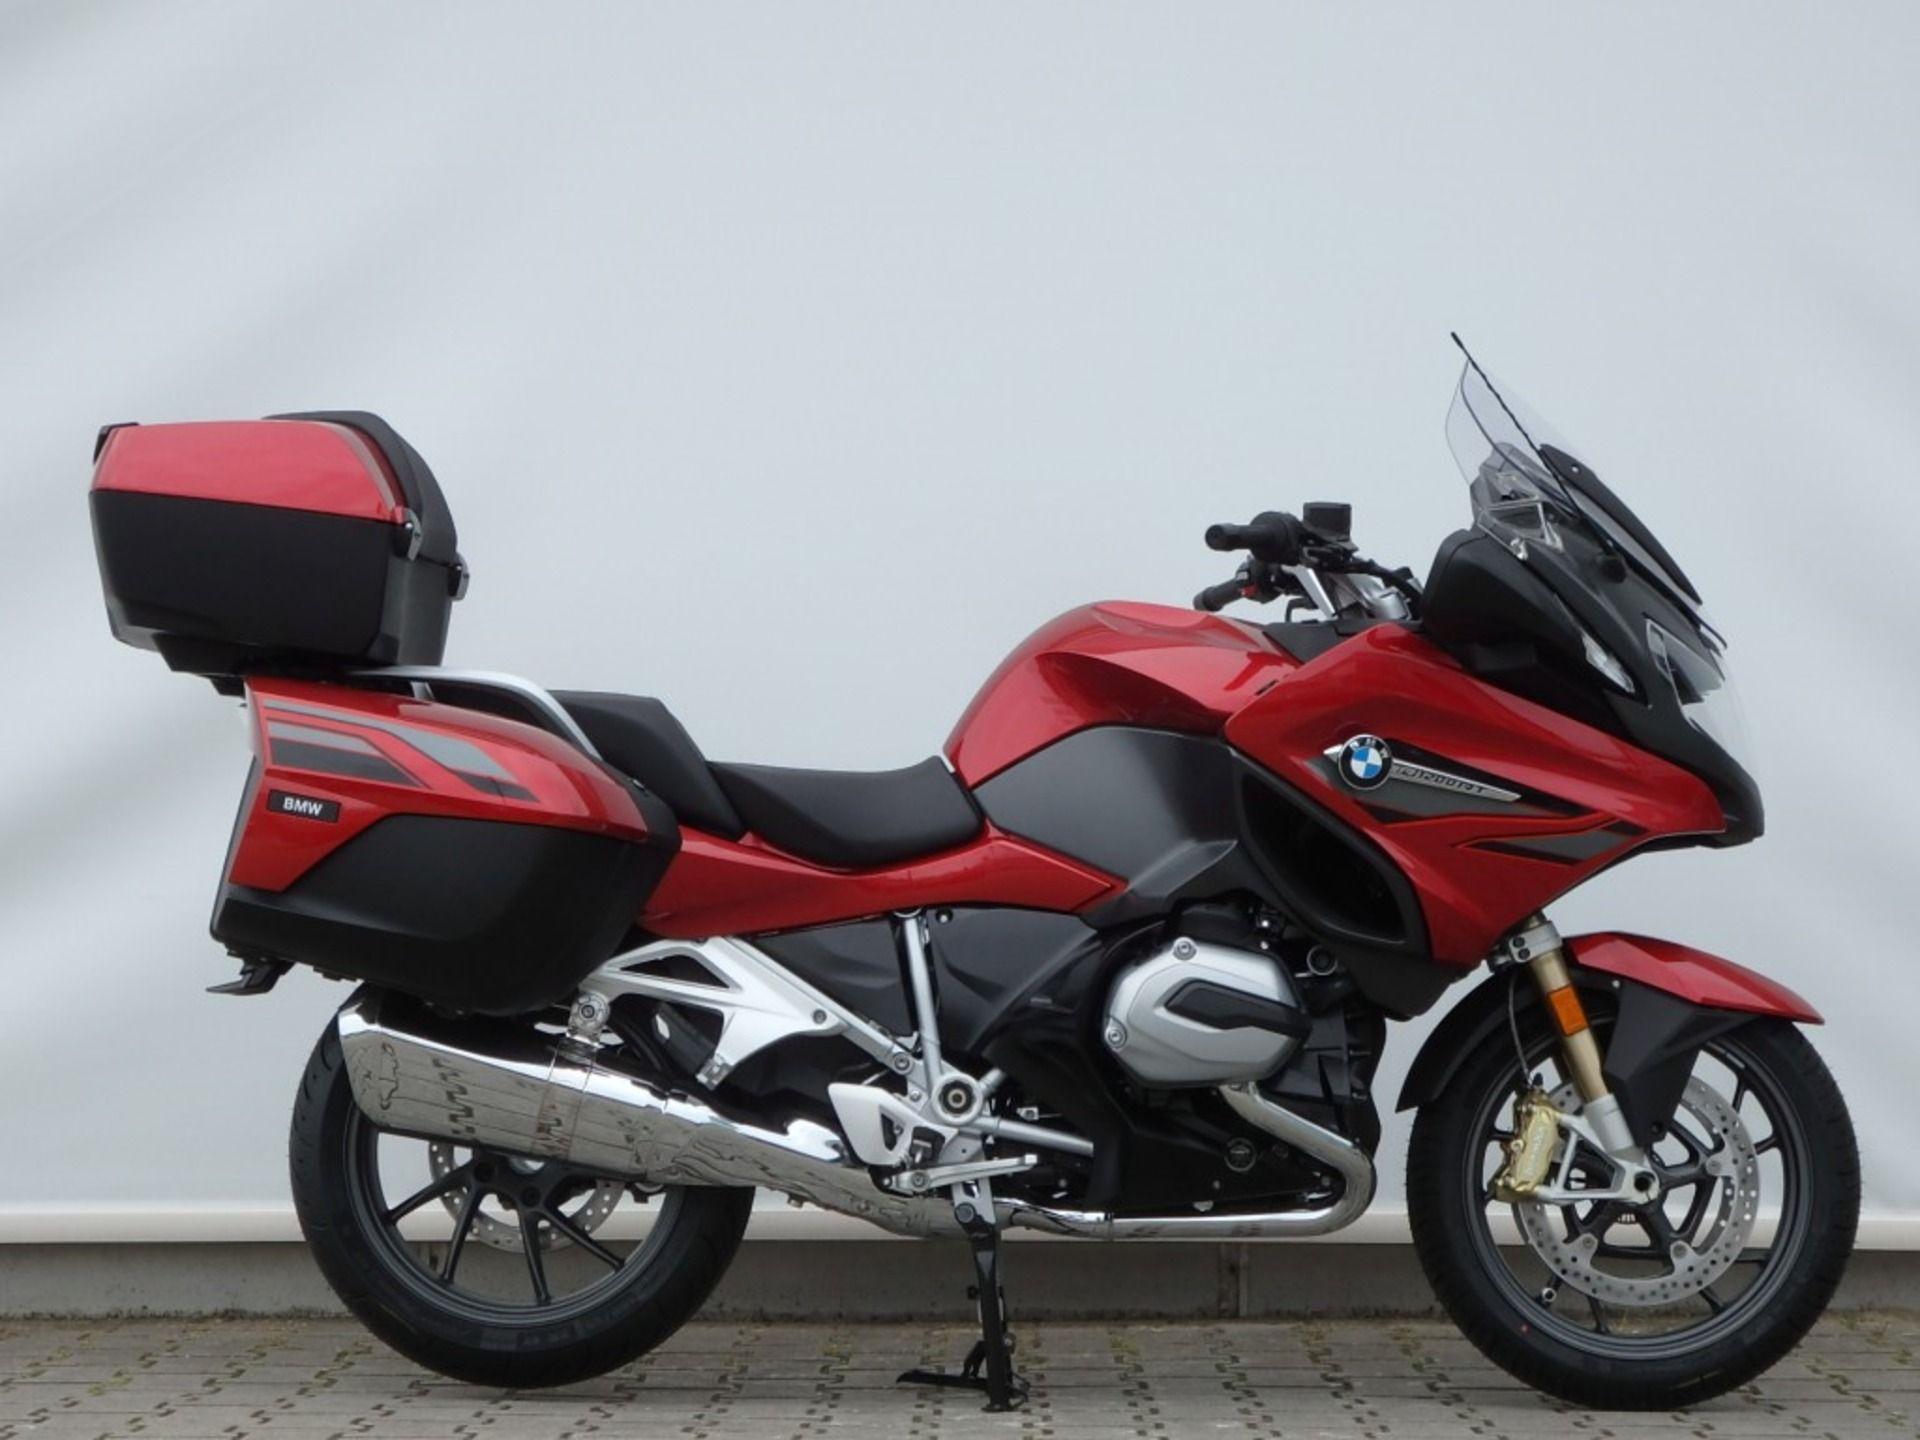 Bmw R 1200 Rt 2018 Motoroccasion Nl Touring Bmw R1200rt